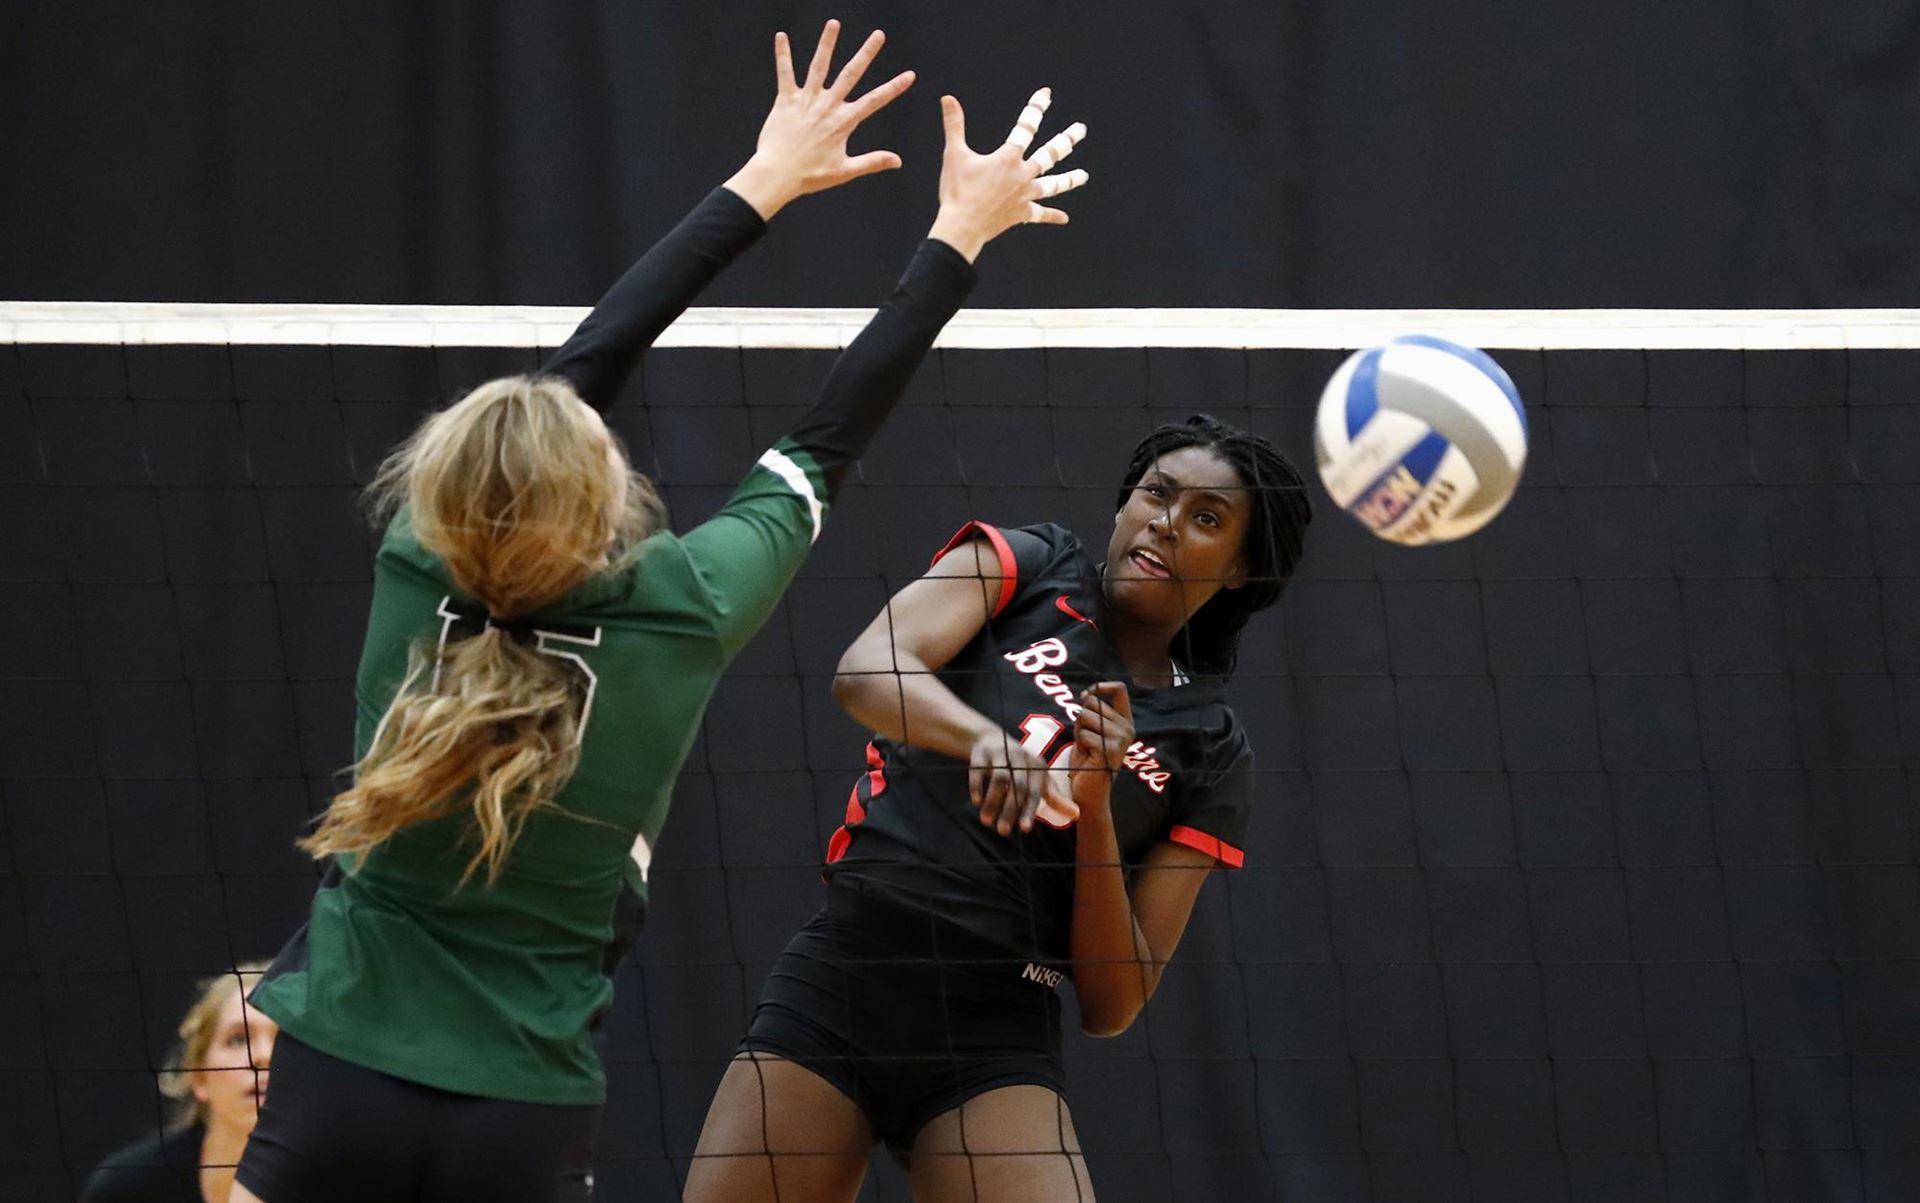 BenU Volleyball player getting a kill